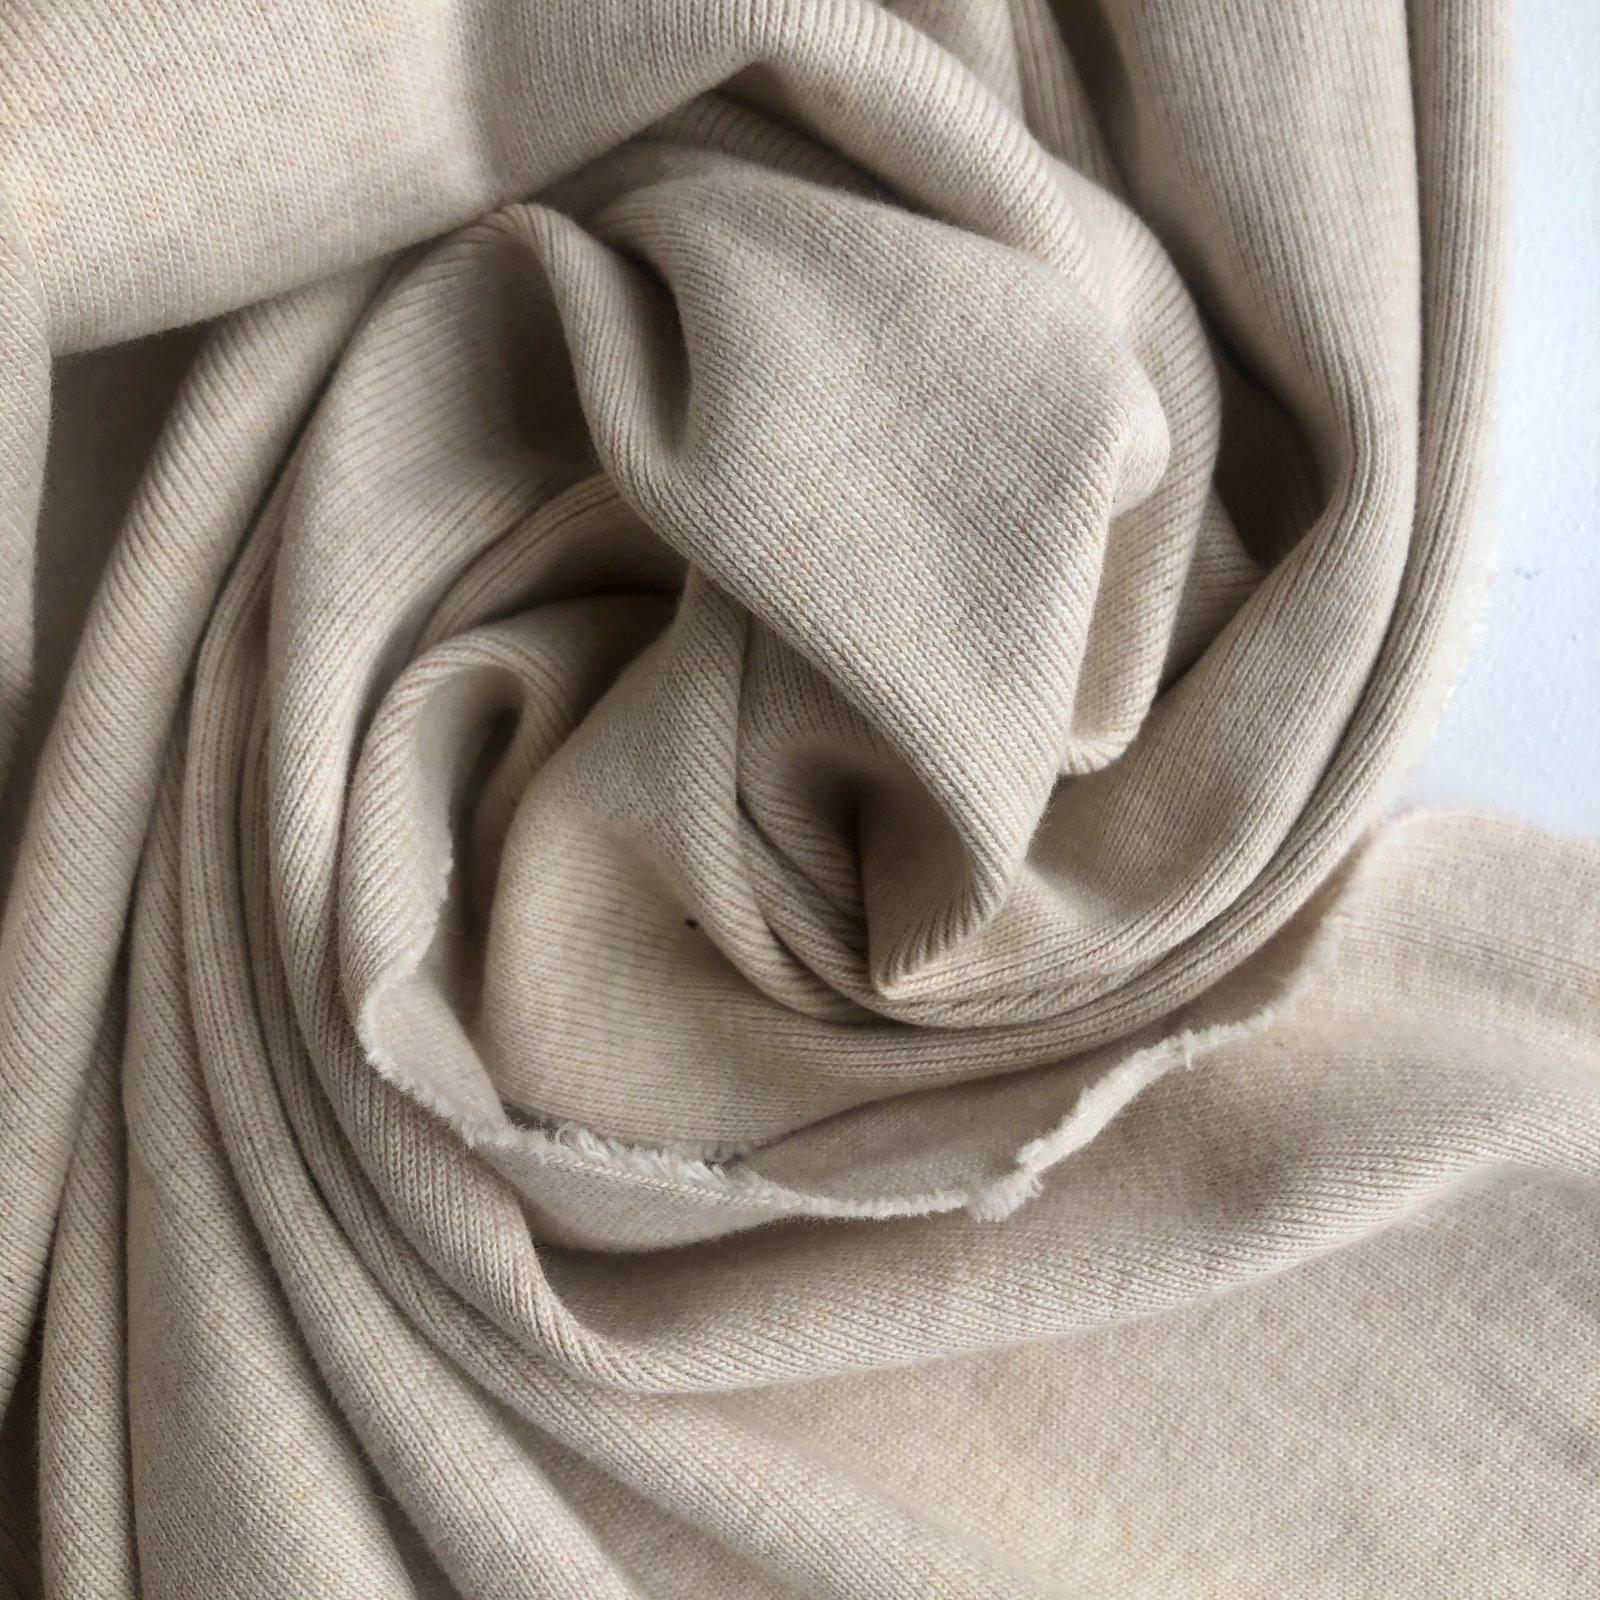 1/4 Yard Cut -- Oeko Tex Certified Cotton Ribbing 12 oz